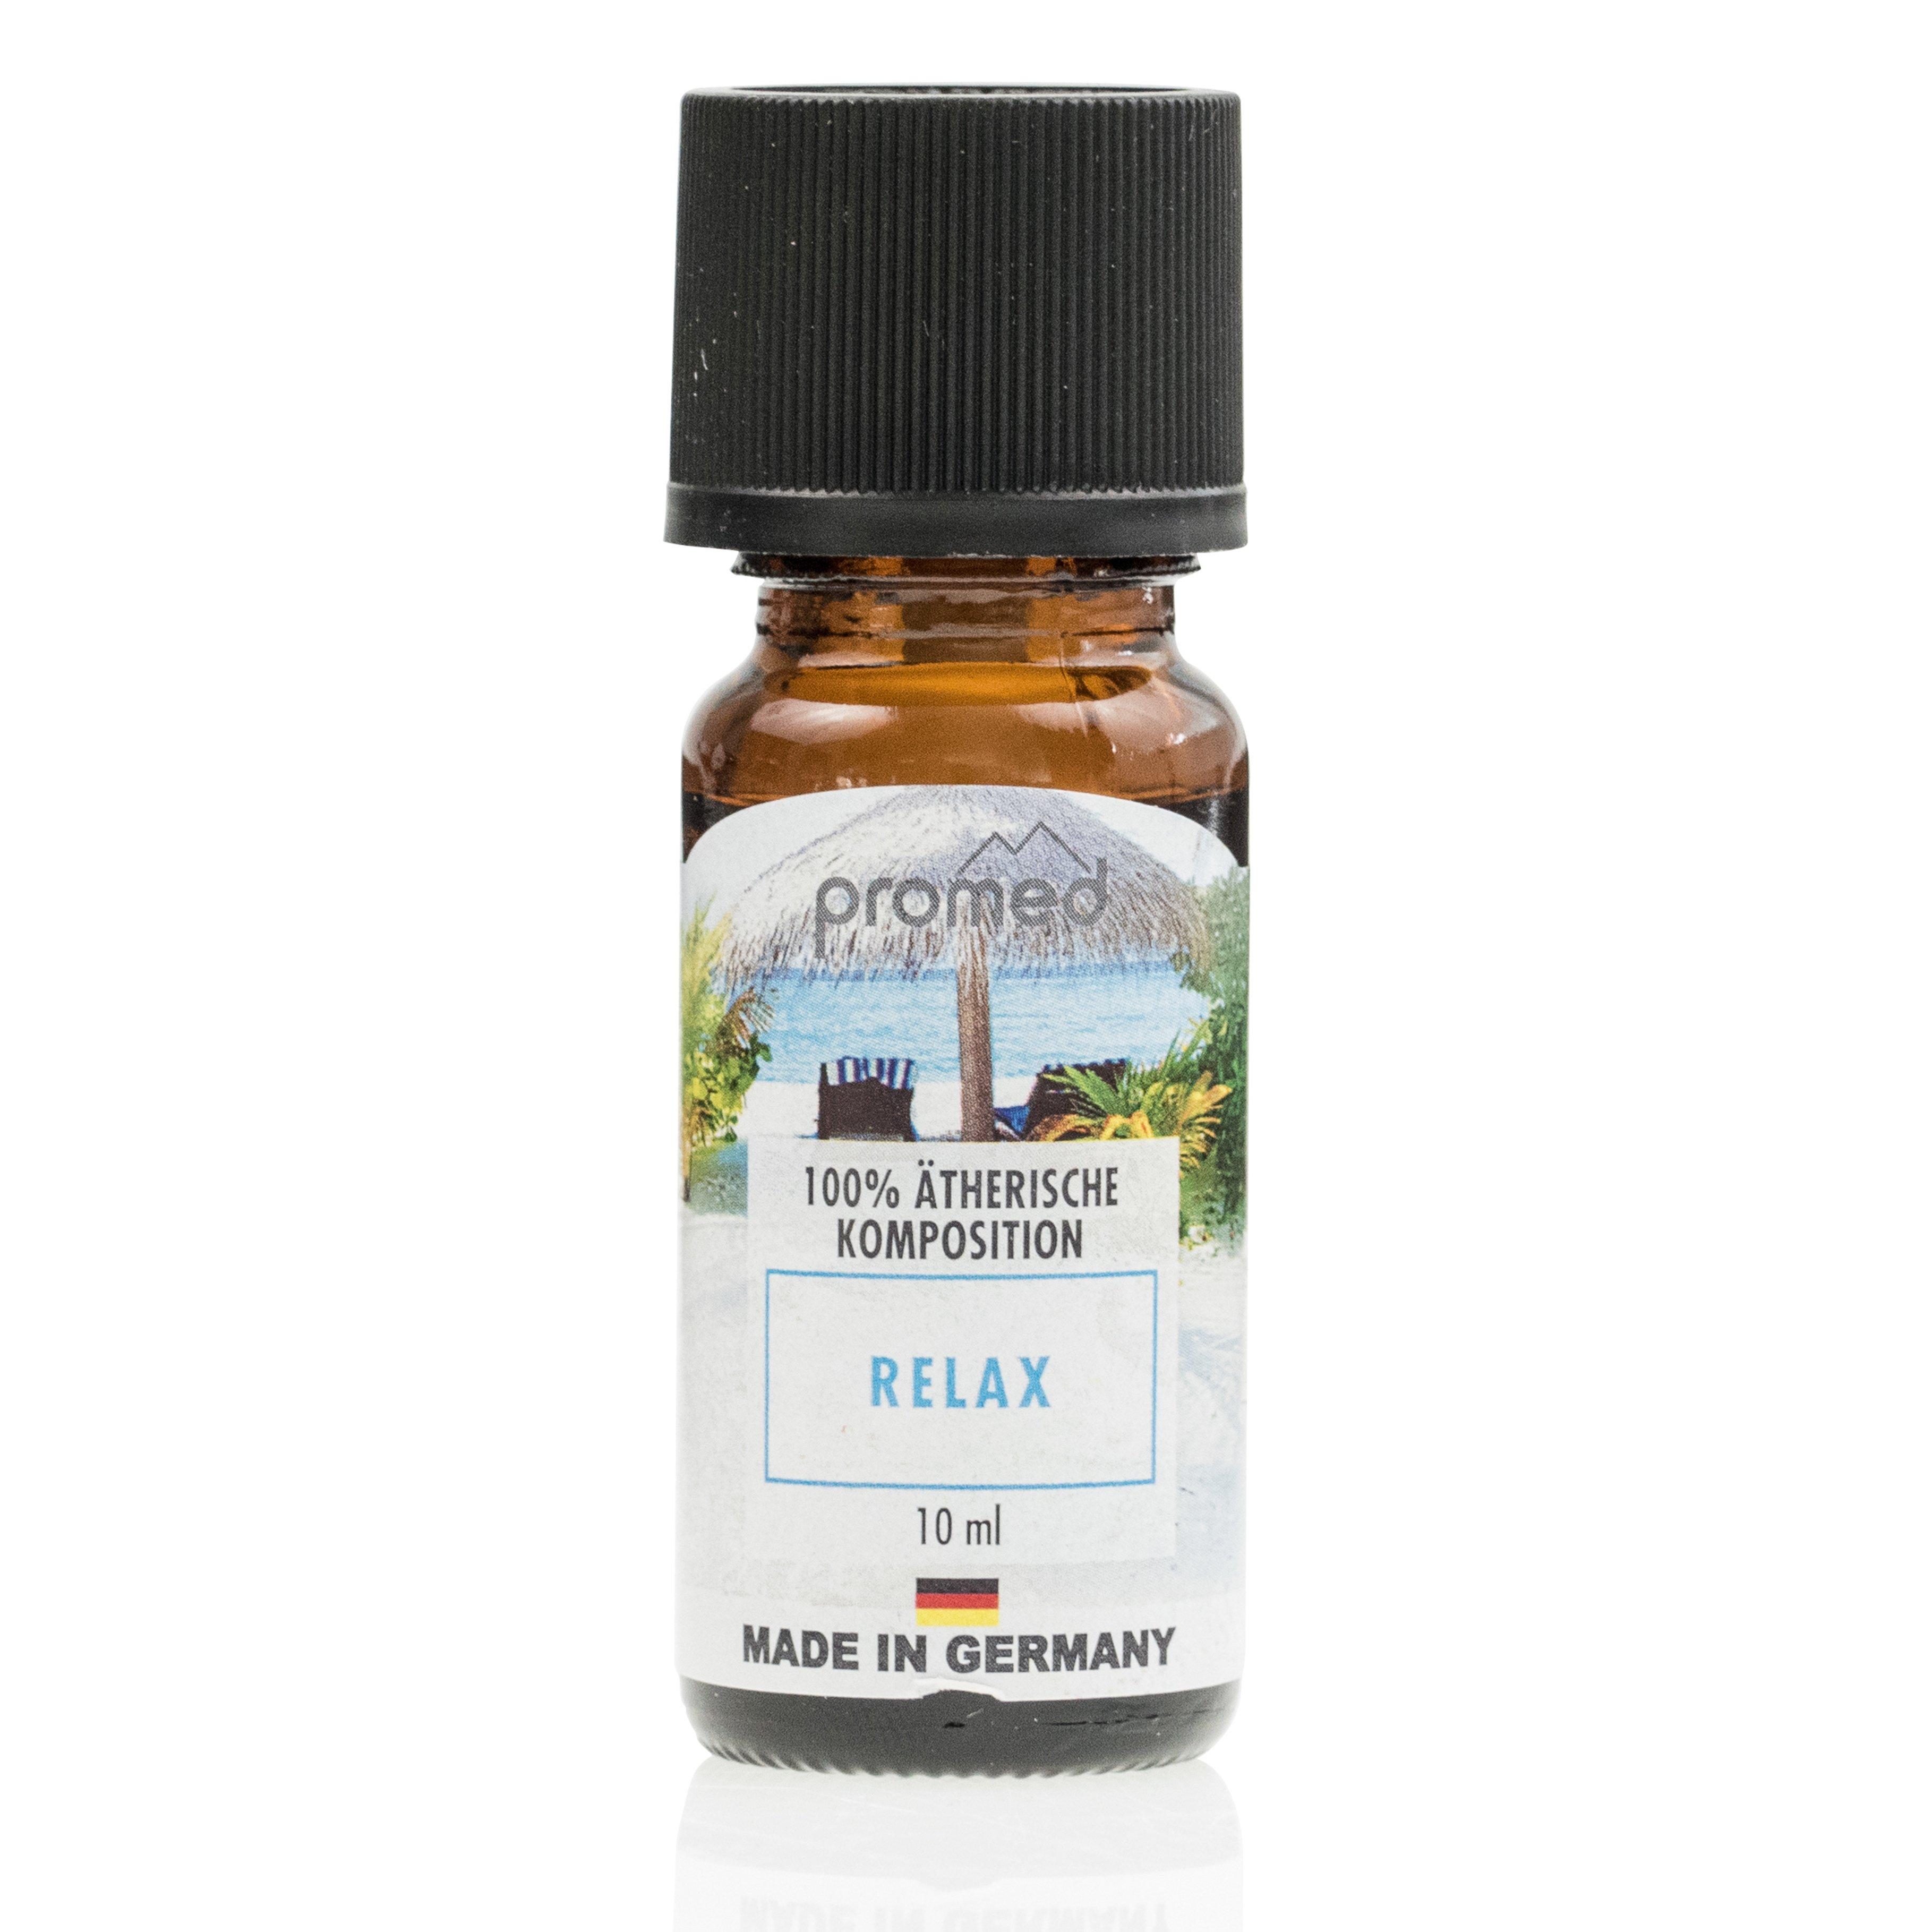 Promed vonný olej 10 ml - Relax